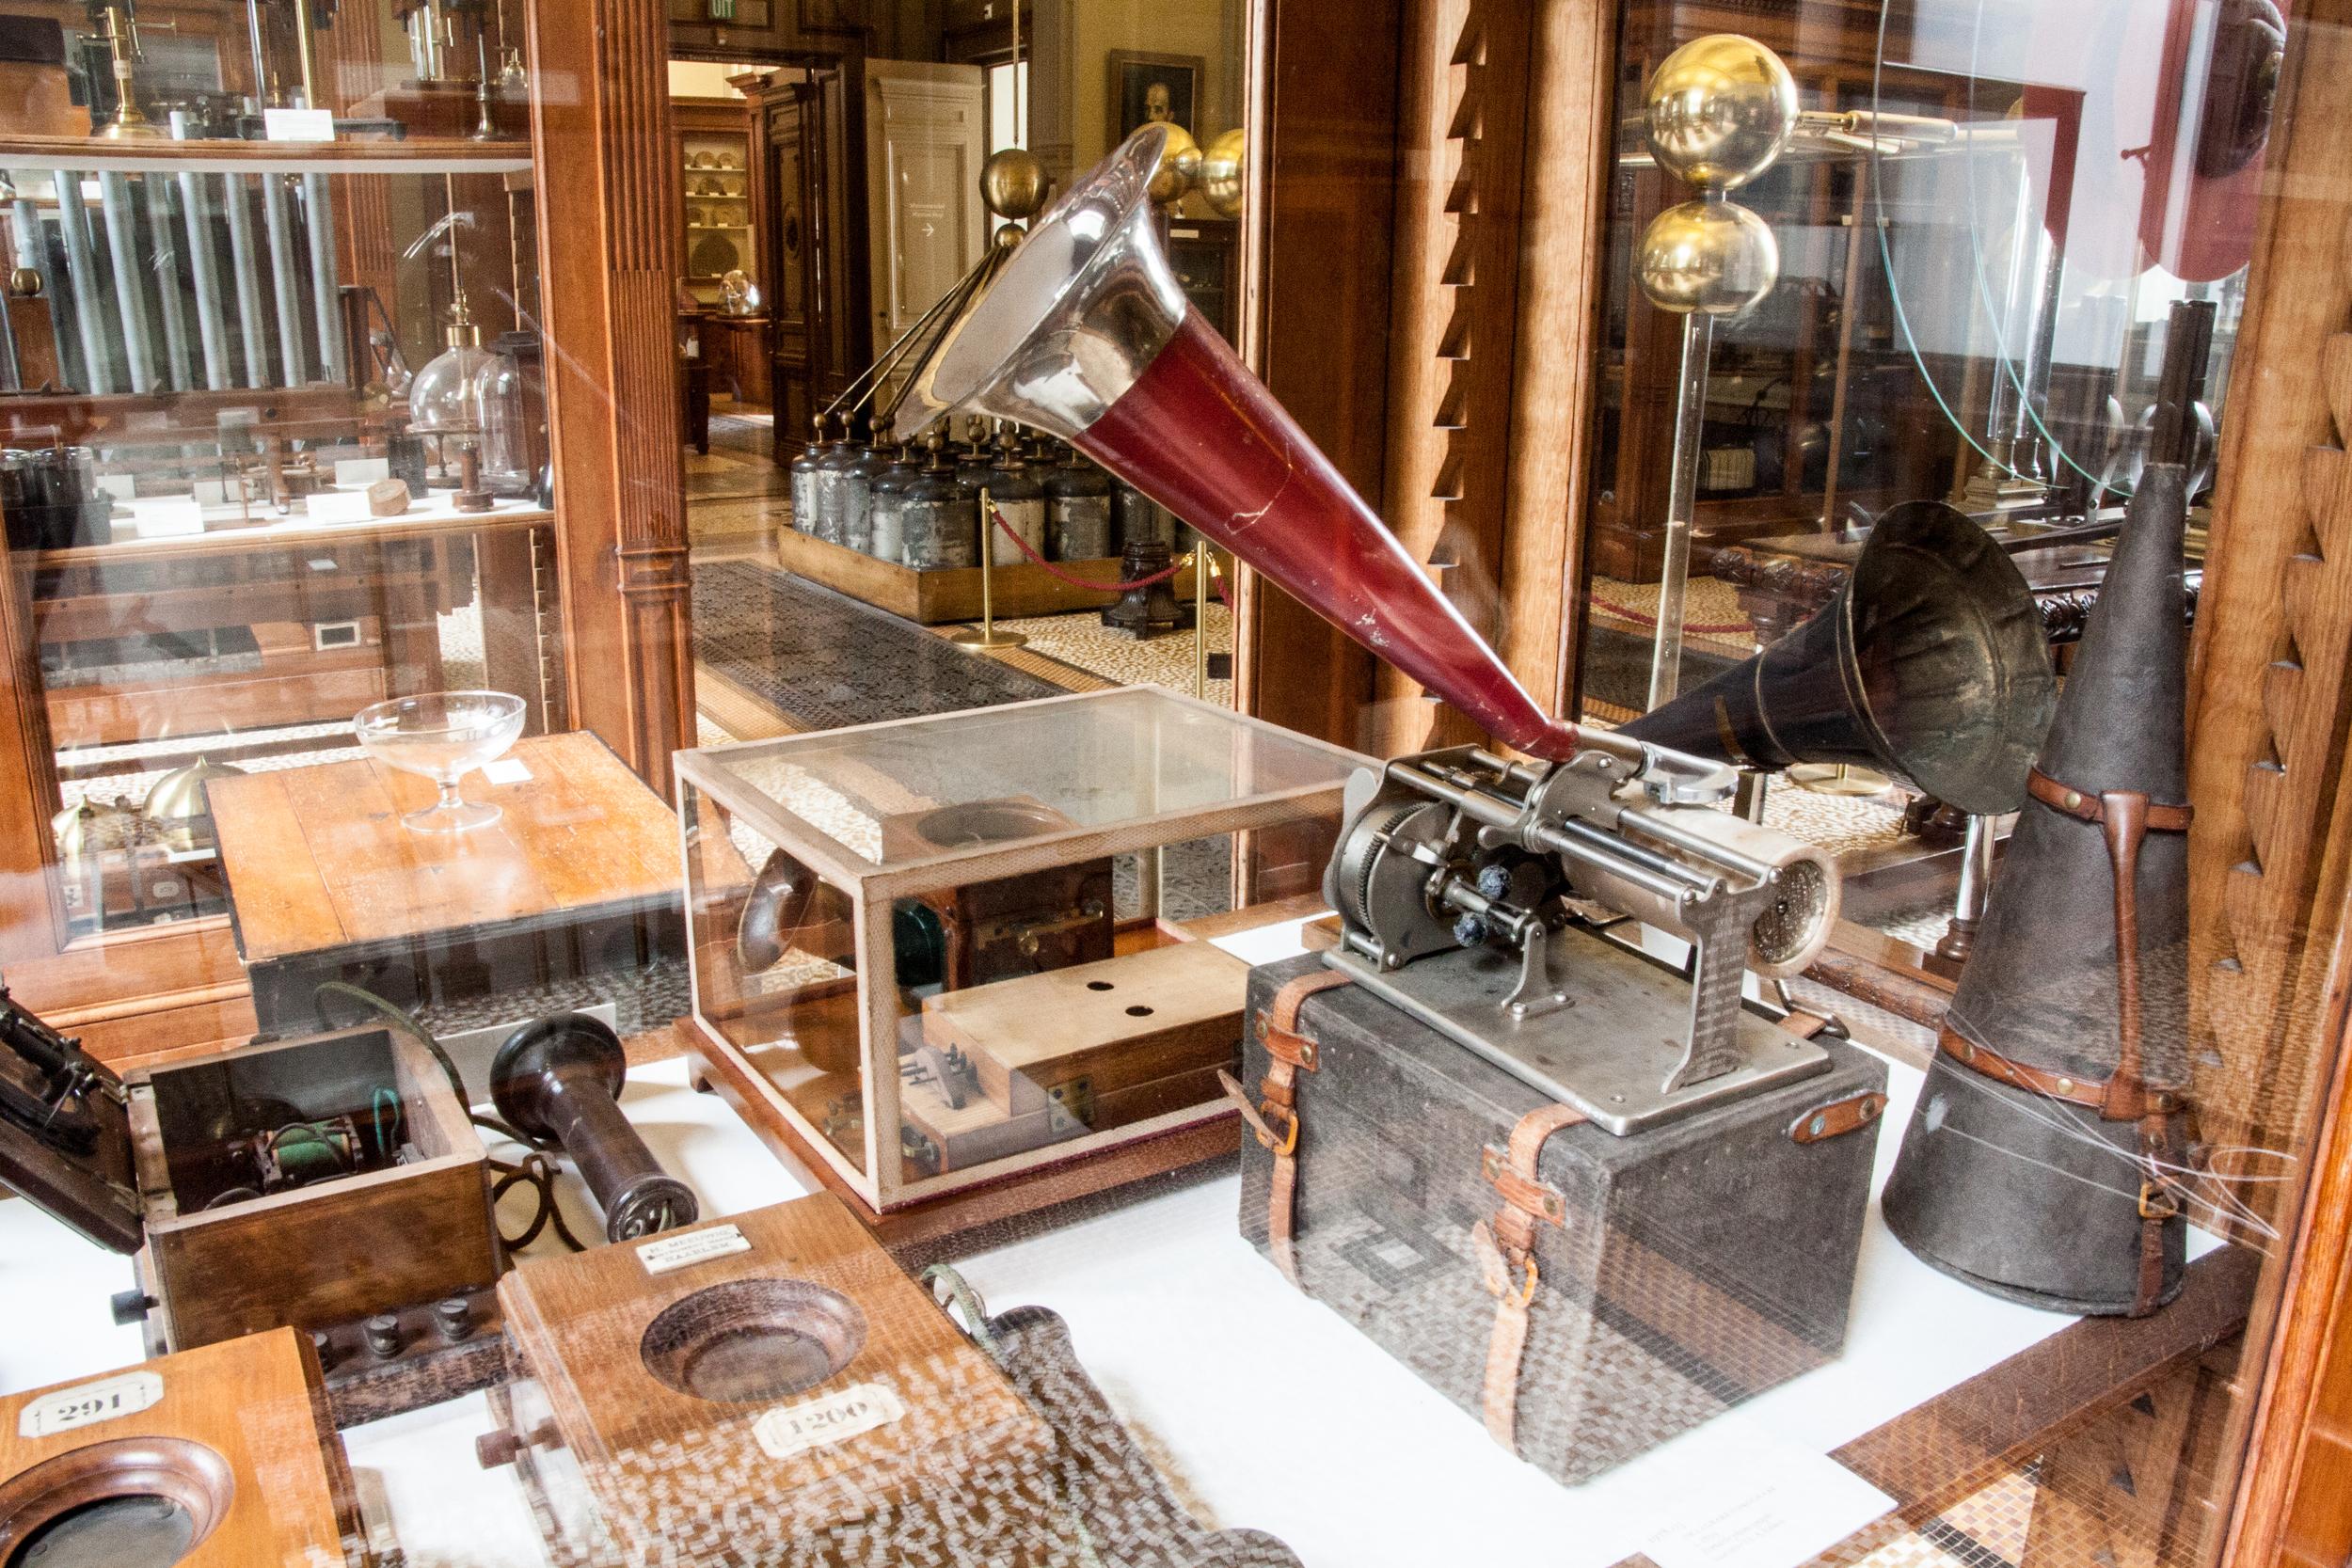 Teylers Museum Instrument Room